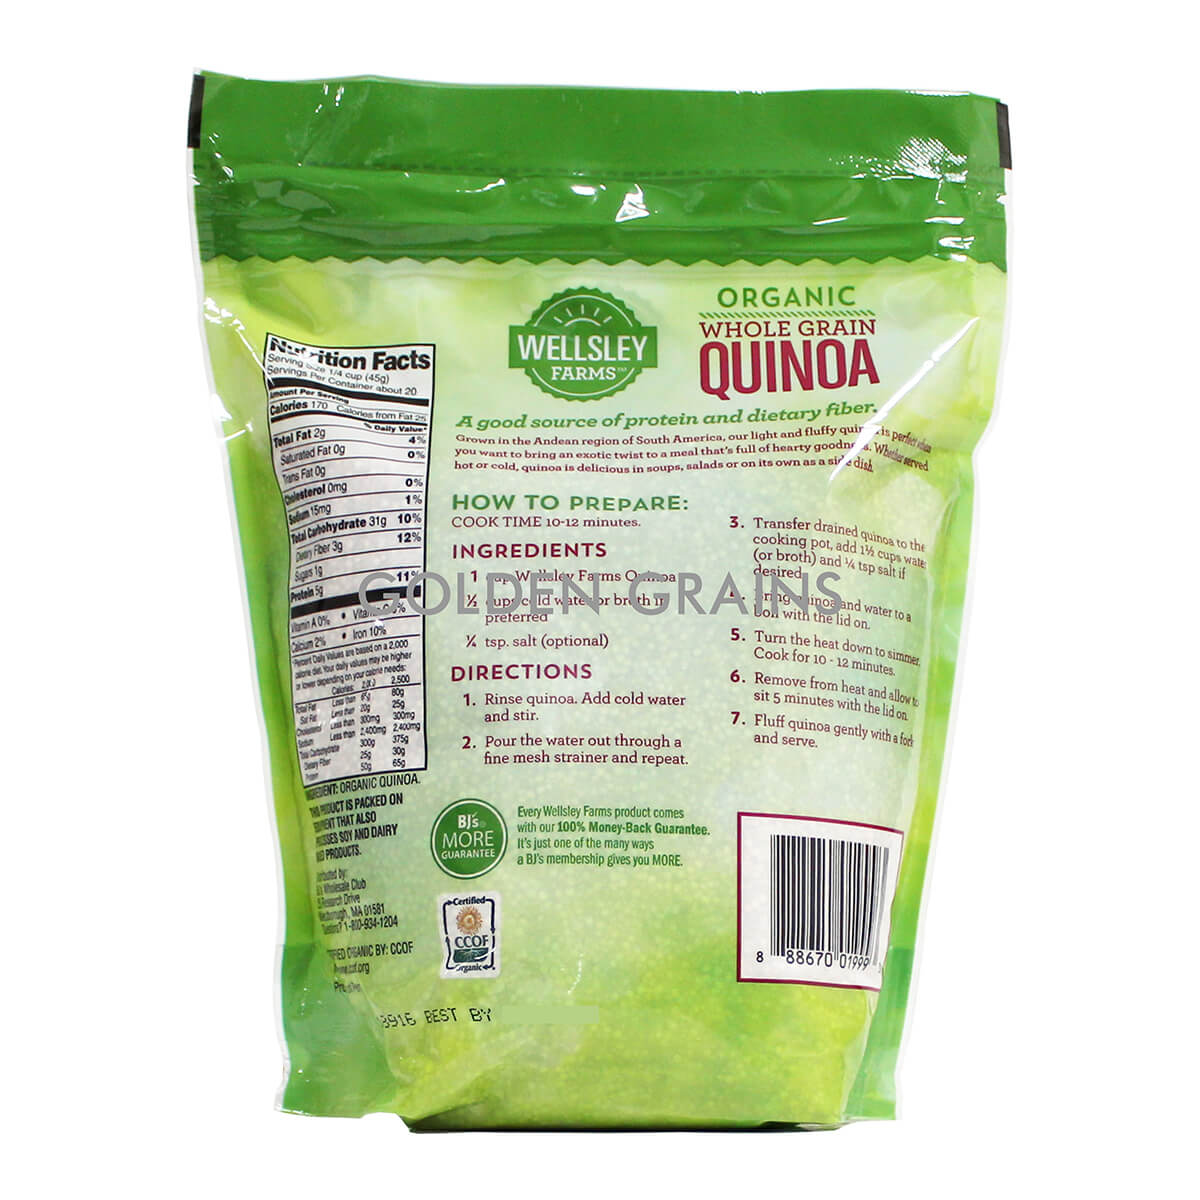 Wellsley Organic Quinoa Back